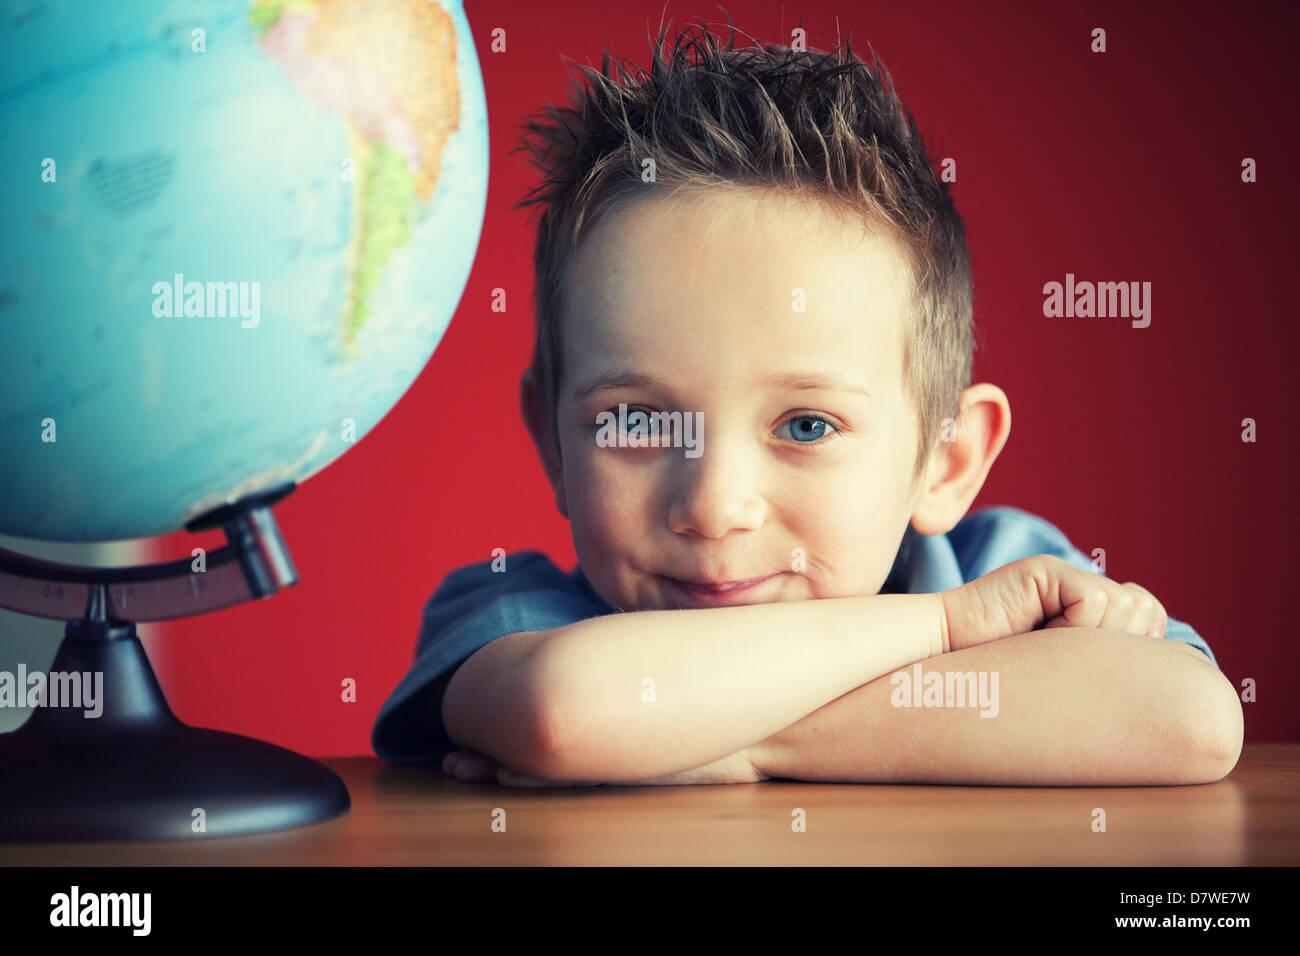 school boy - Stock Image